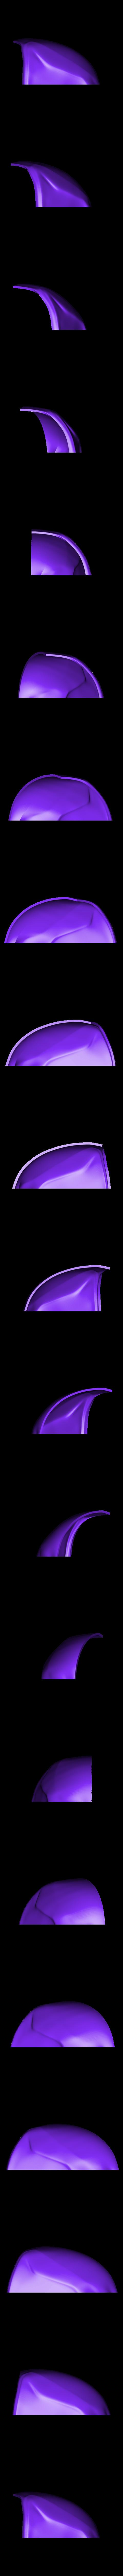 Part_1_v2.stl Download free STL file Deathstroke Mask with two eyes • 3D printing model, VillainousPropShop